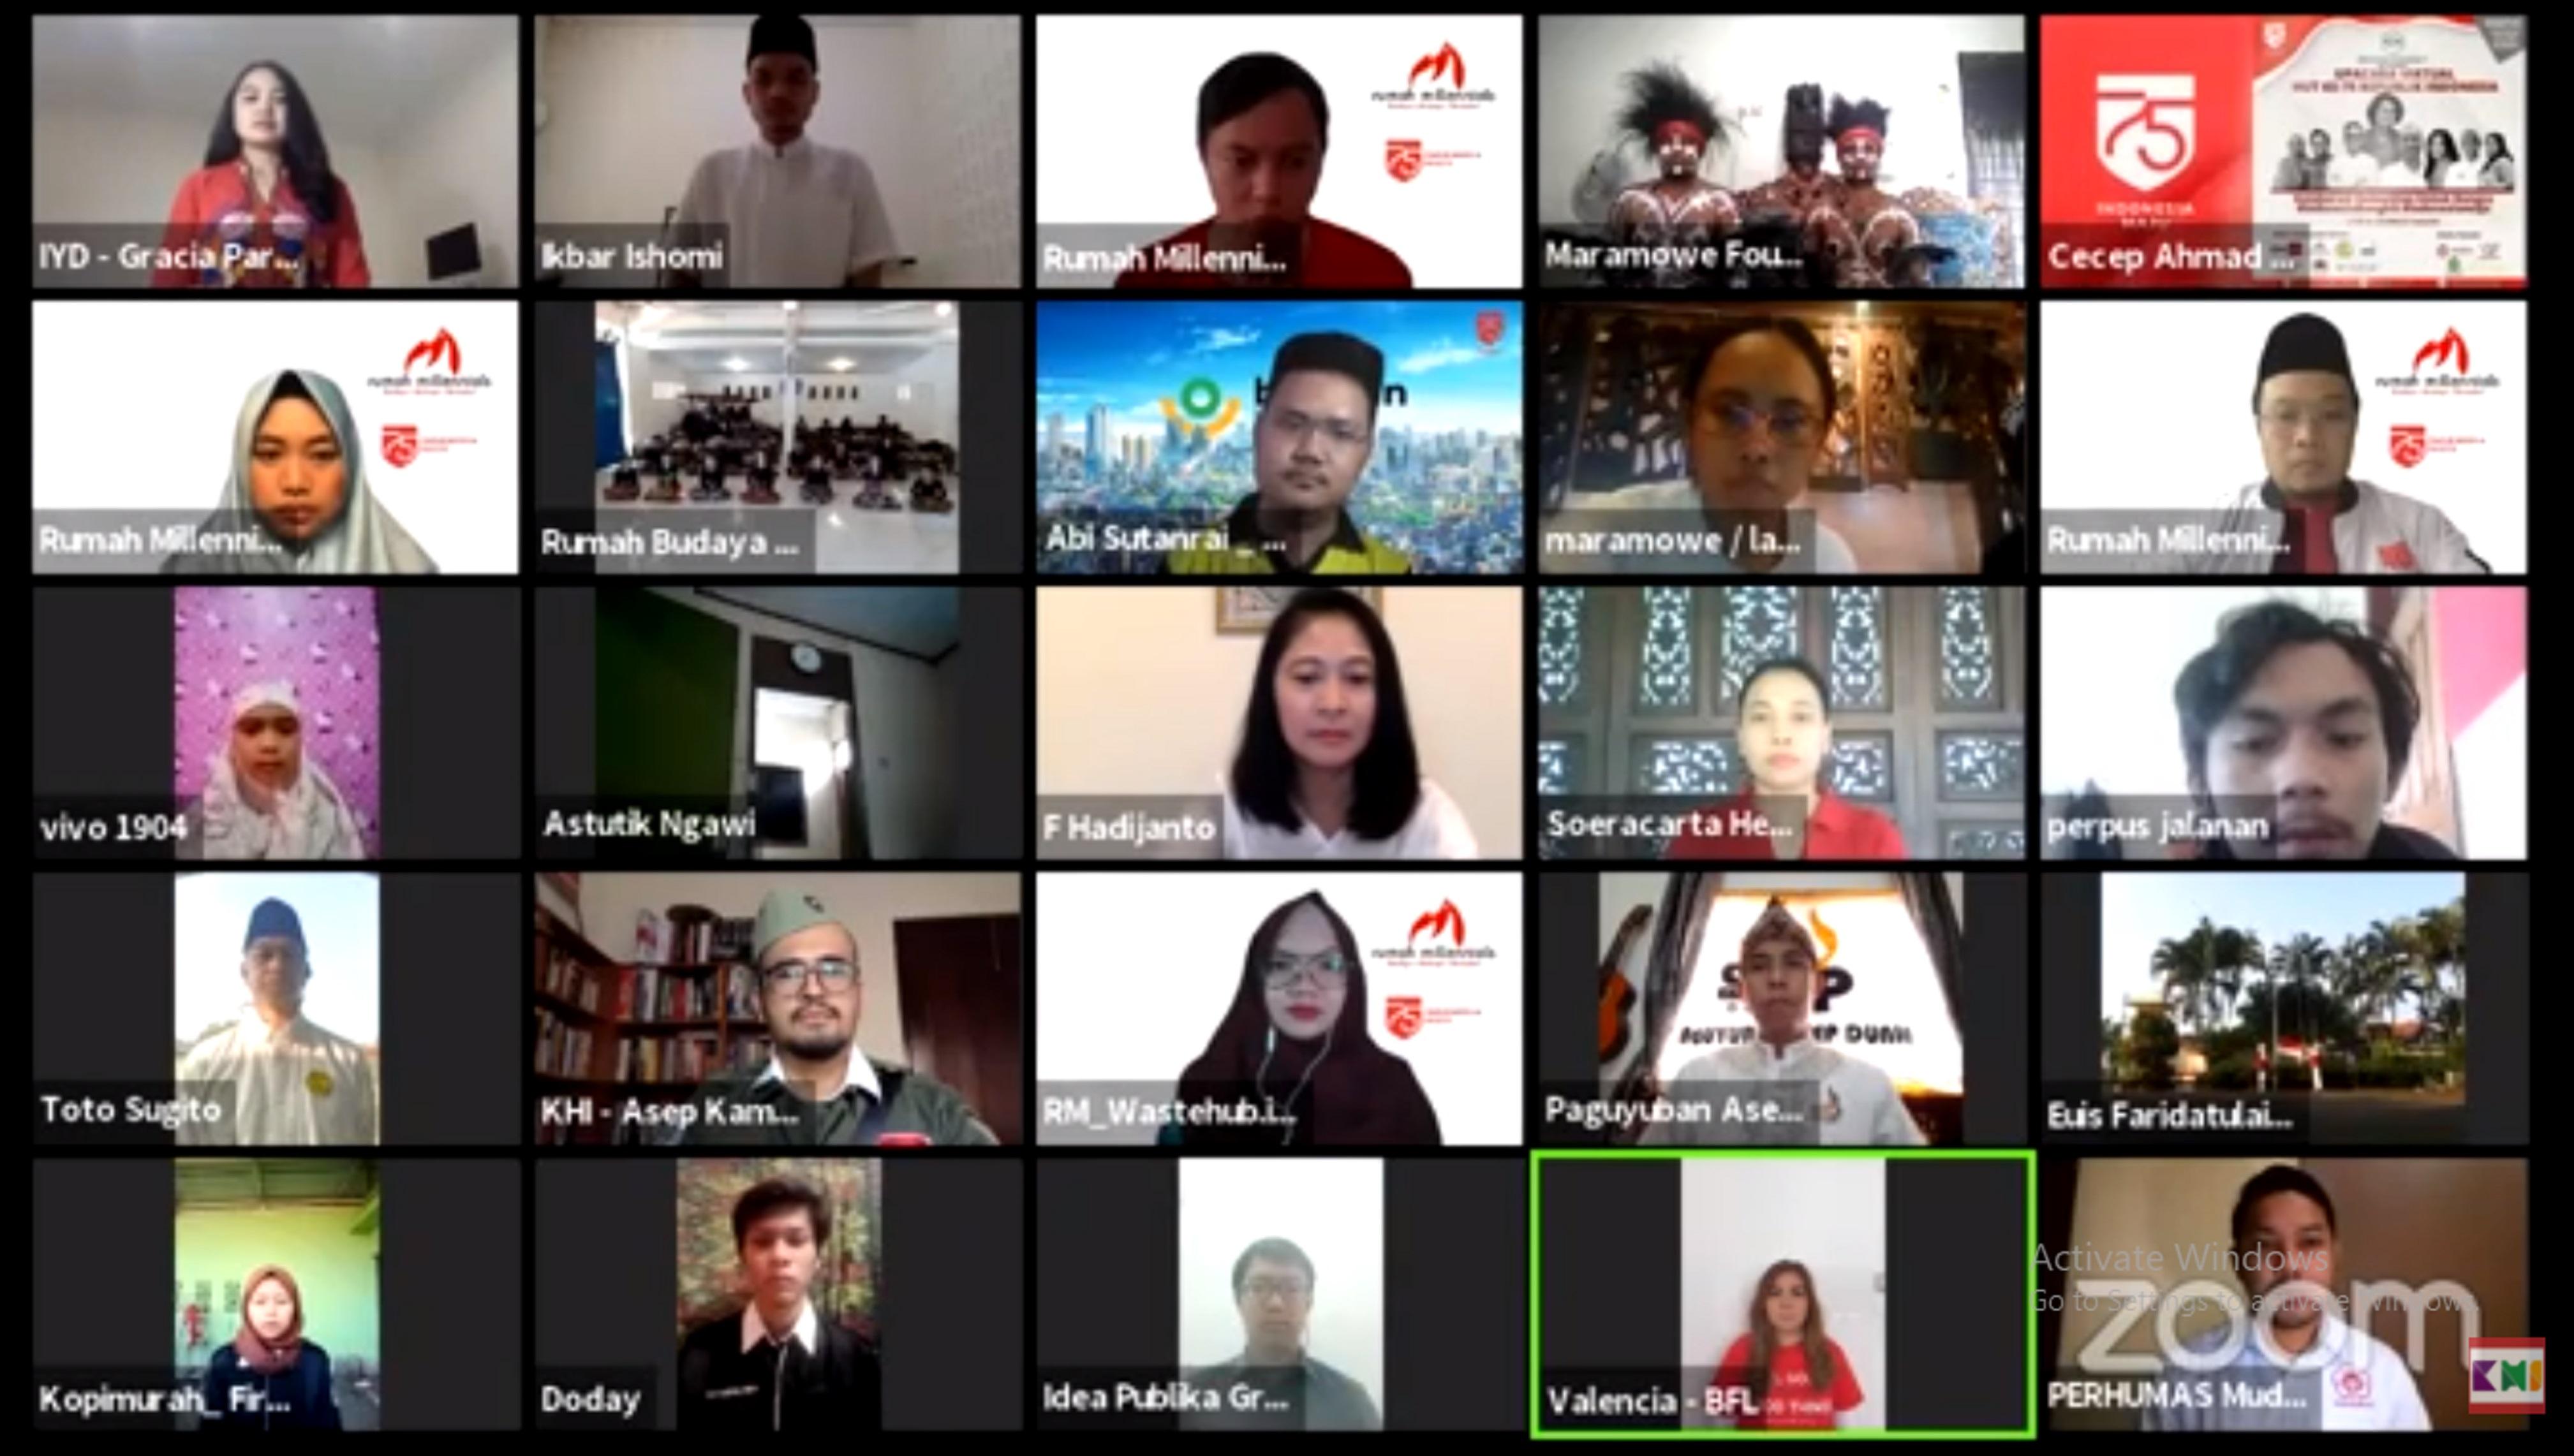 Potret upacara virtual   Foto: Youtube Komunitas Historia Indonesia